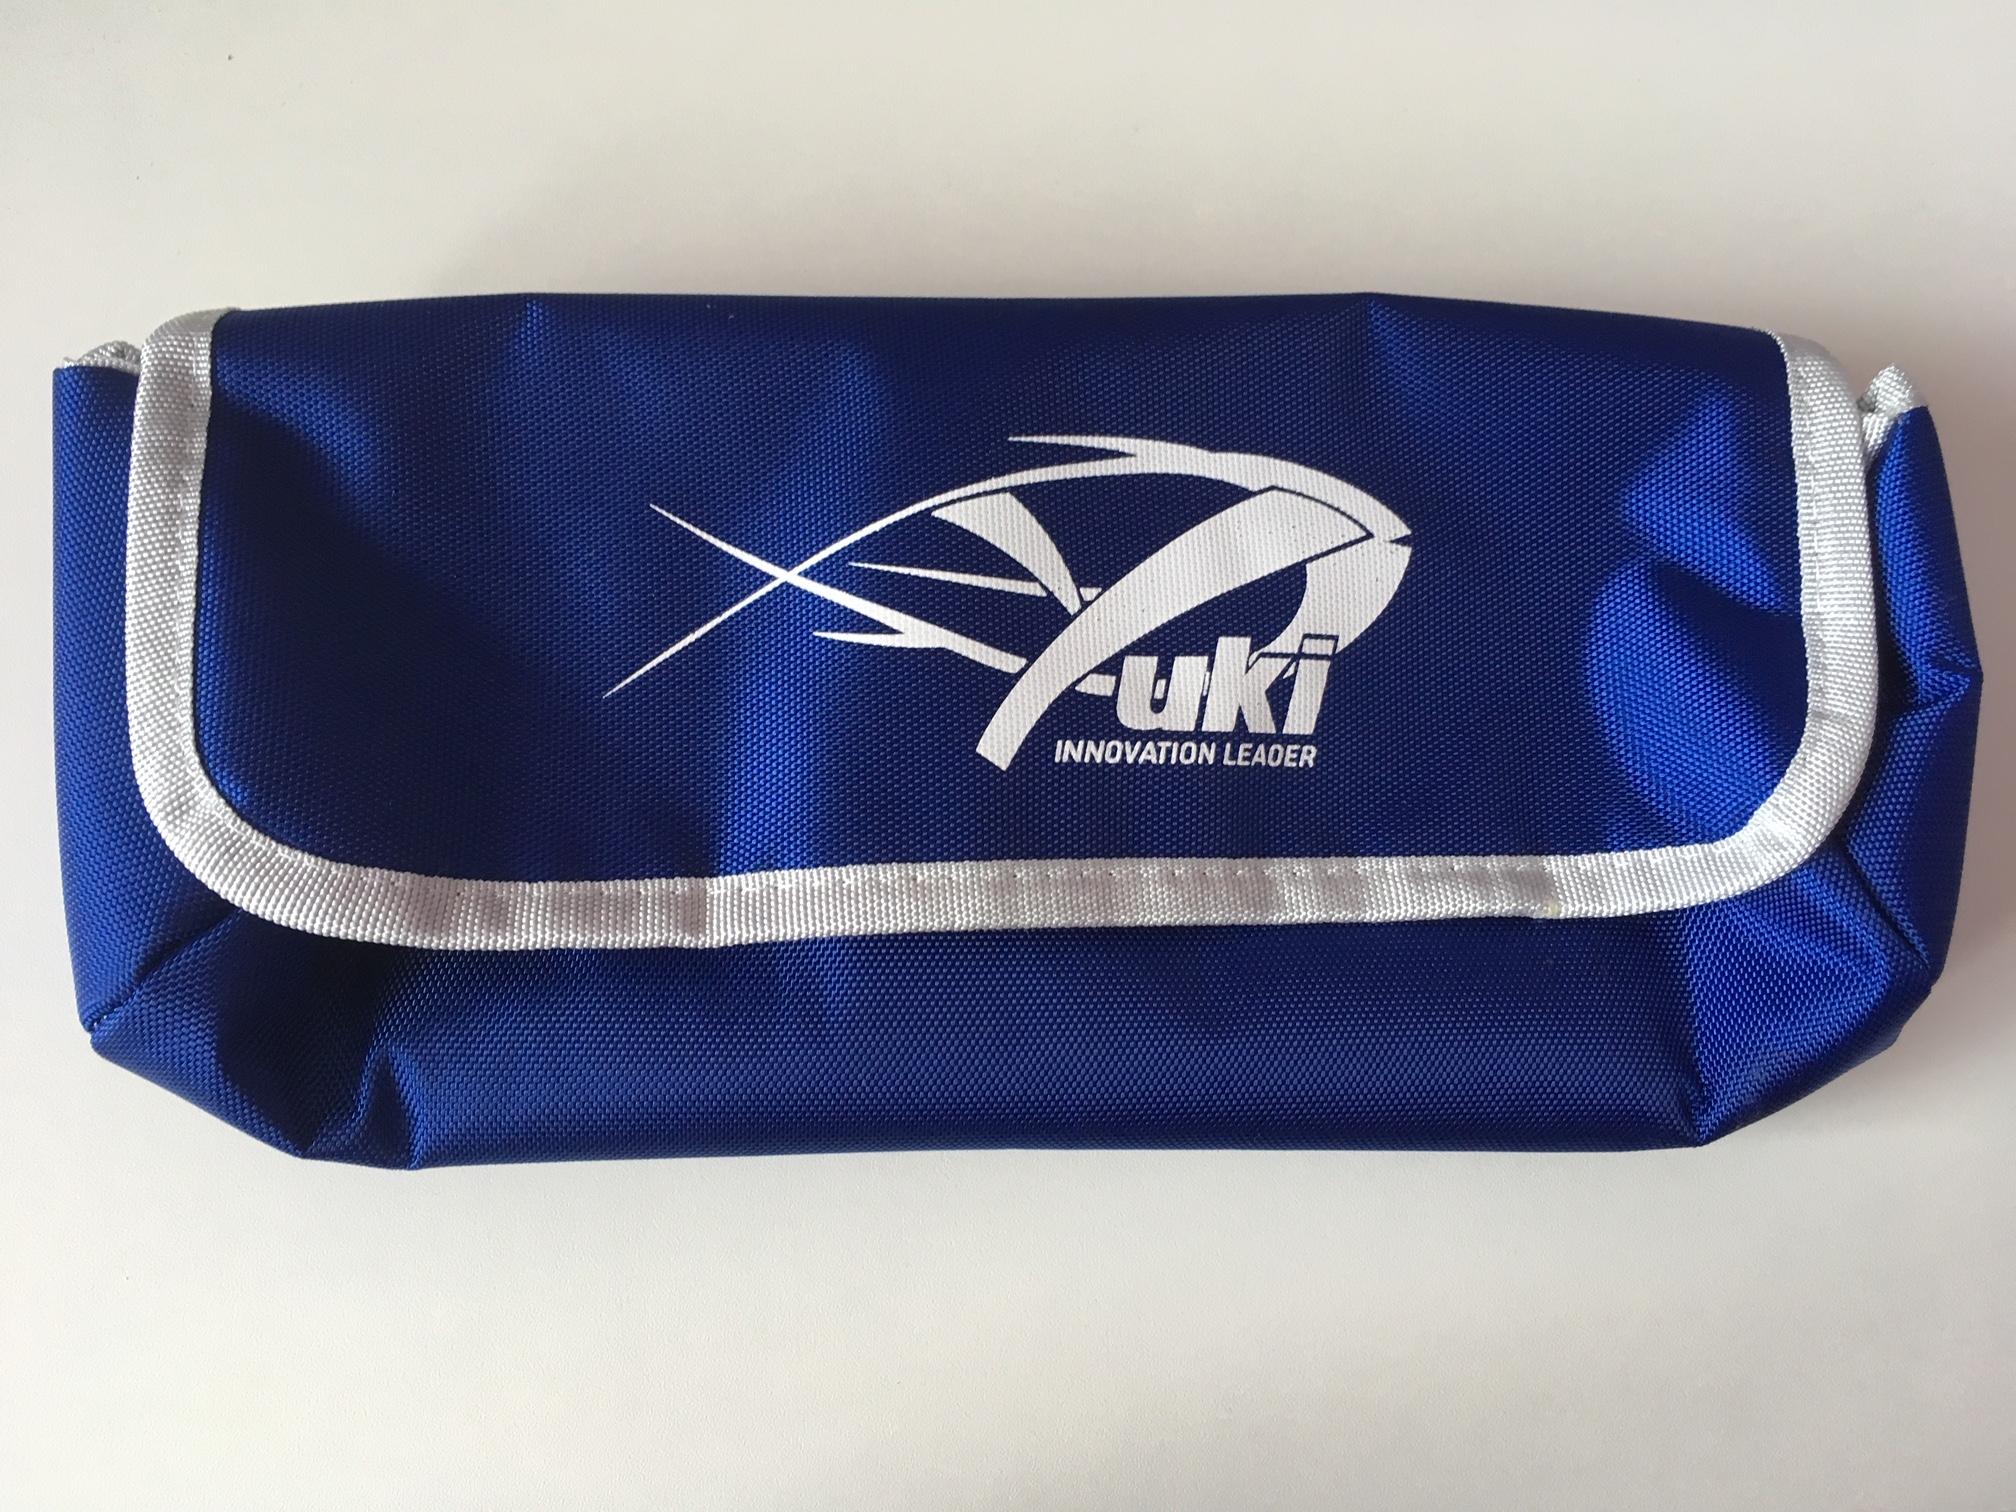 Yuki spool bag jpeg